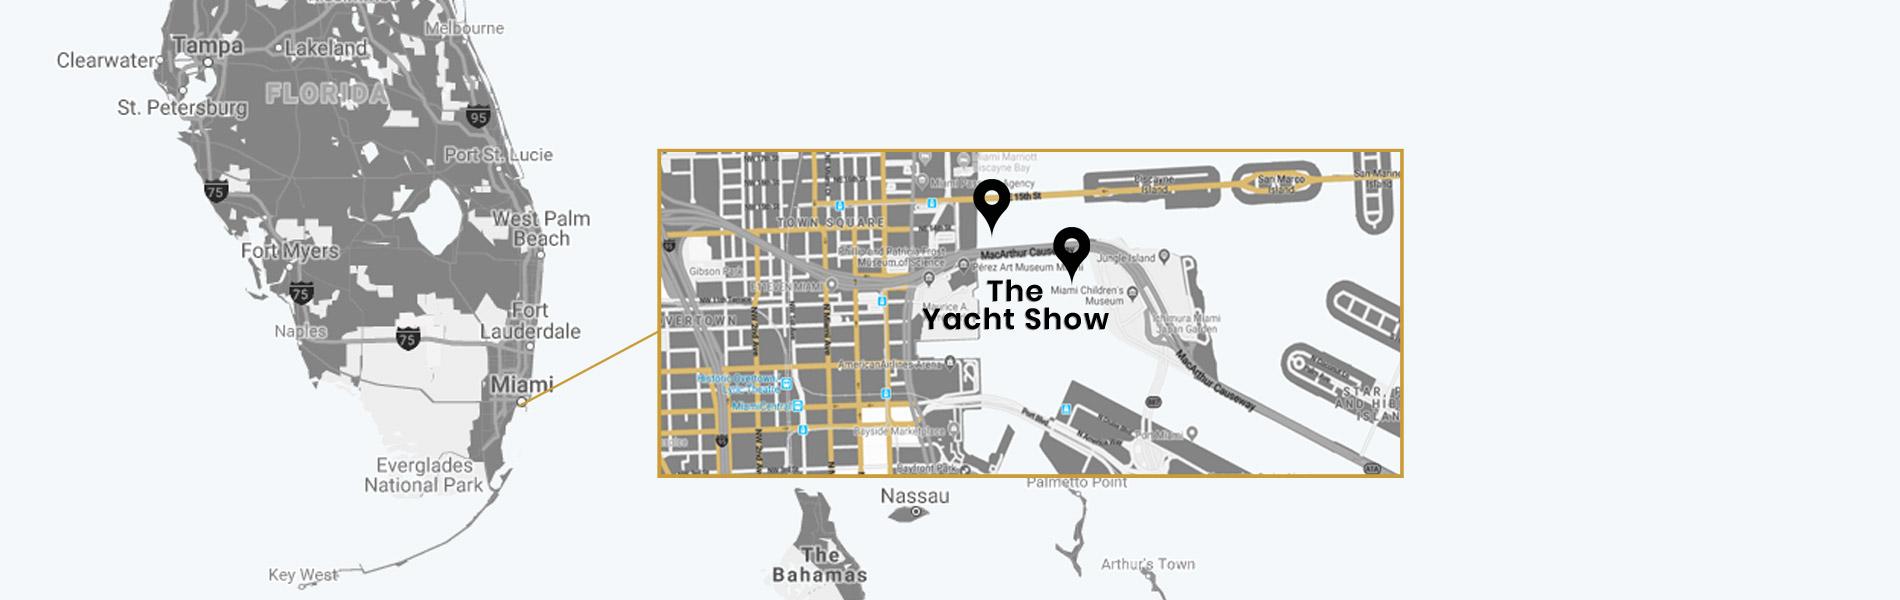 miami international yacht show 2019 downtown miami and watson